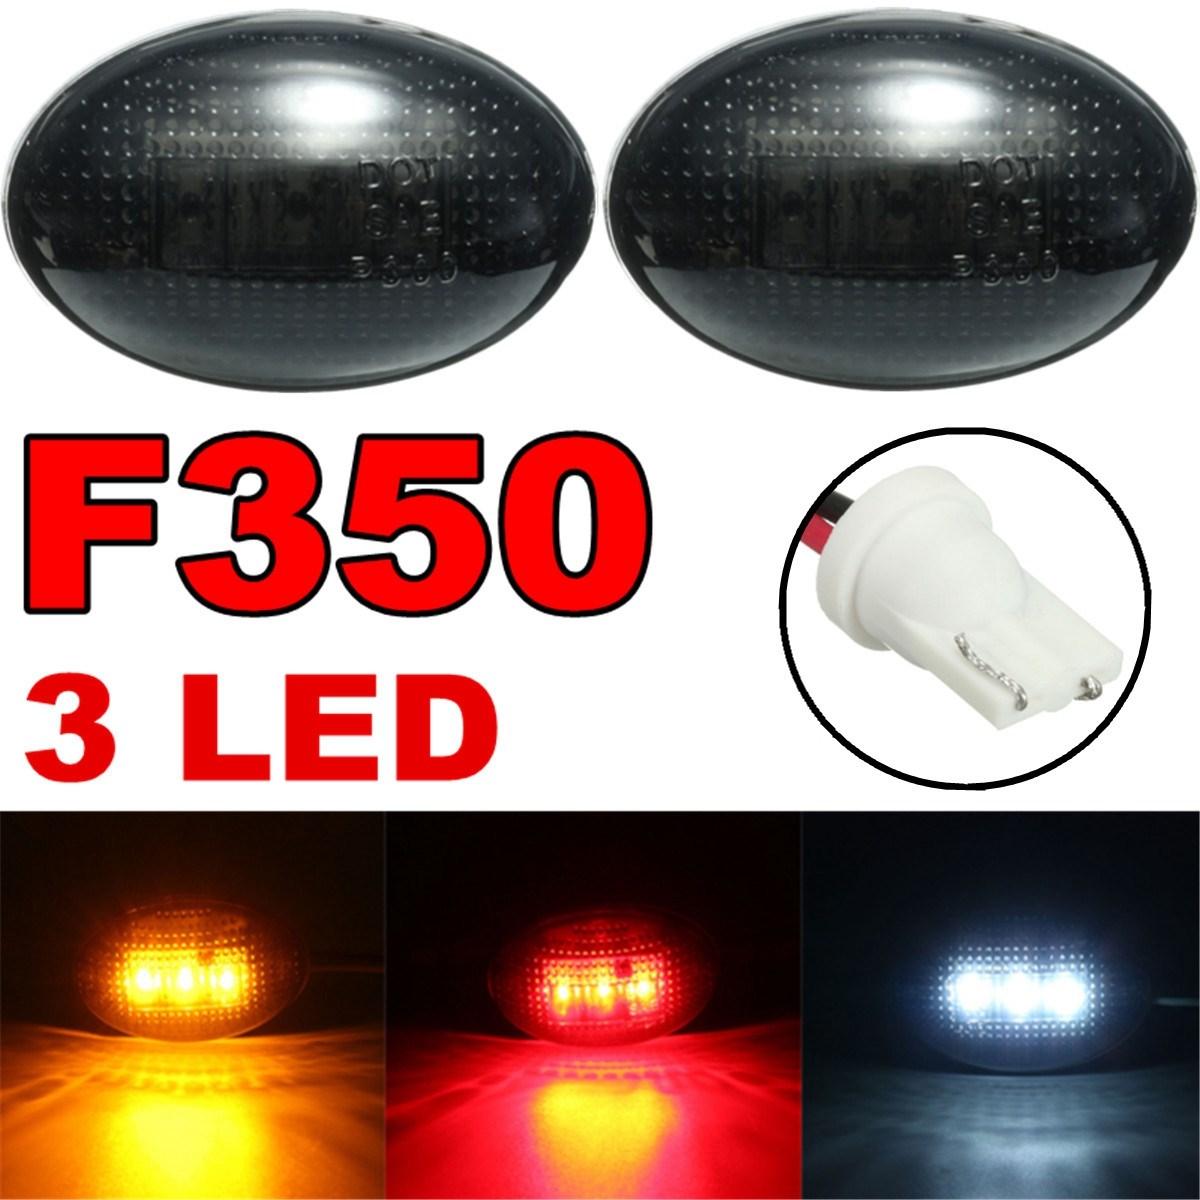 1Pcs Smoke Side Rear For Fender Marker LED Light Lamp Bar For Ford F150 F250 F350 F450